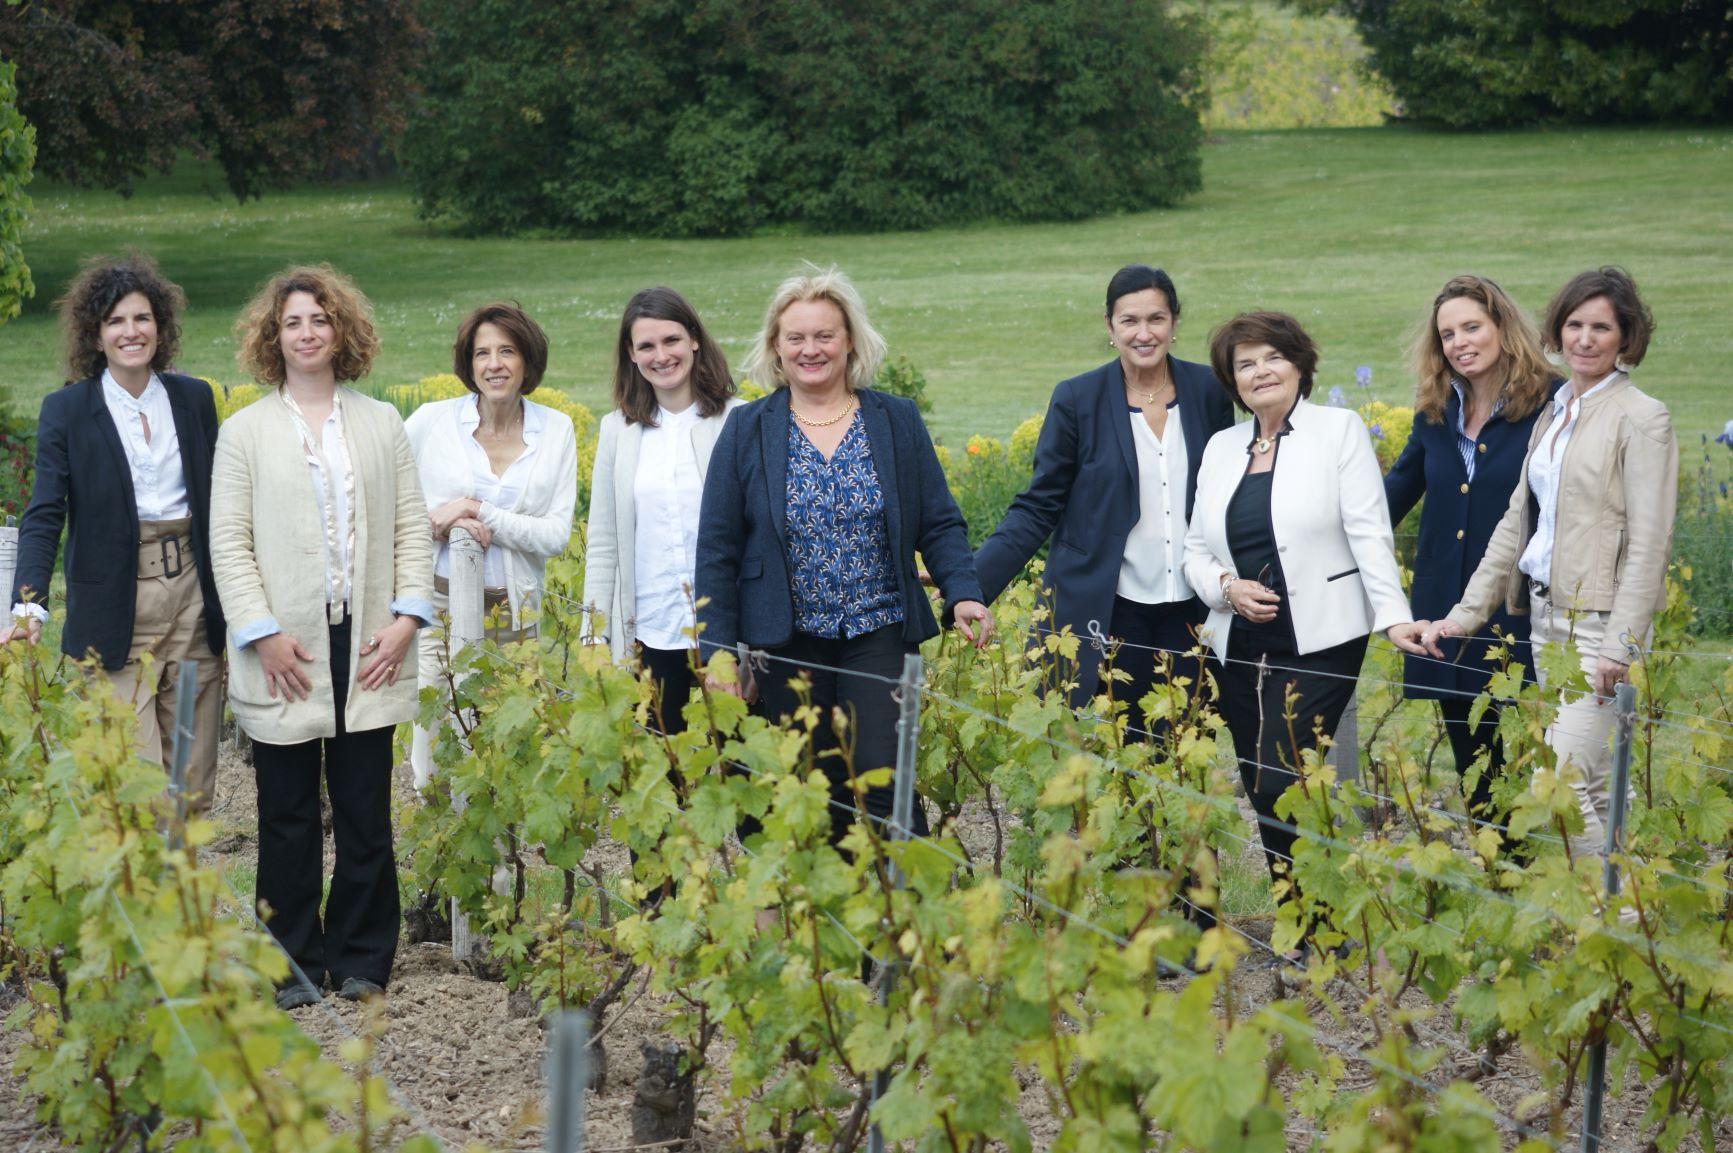 Wonderful article in the magazine «3 étoiles» on La Transmission-Femmes en Champagne Superbe article dans le magazine « 3 étoiles » sur La Transmission-Femmes en Champagne